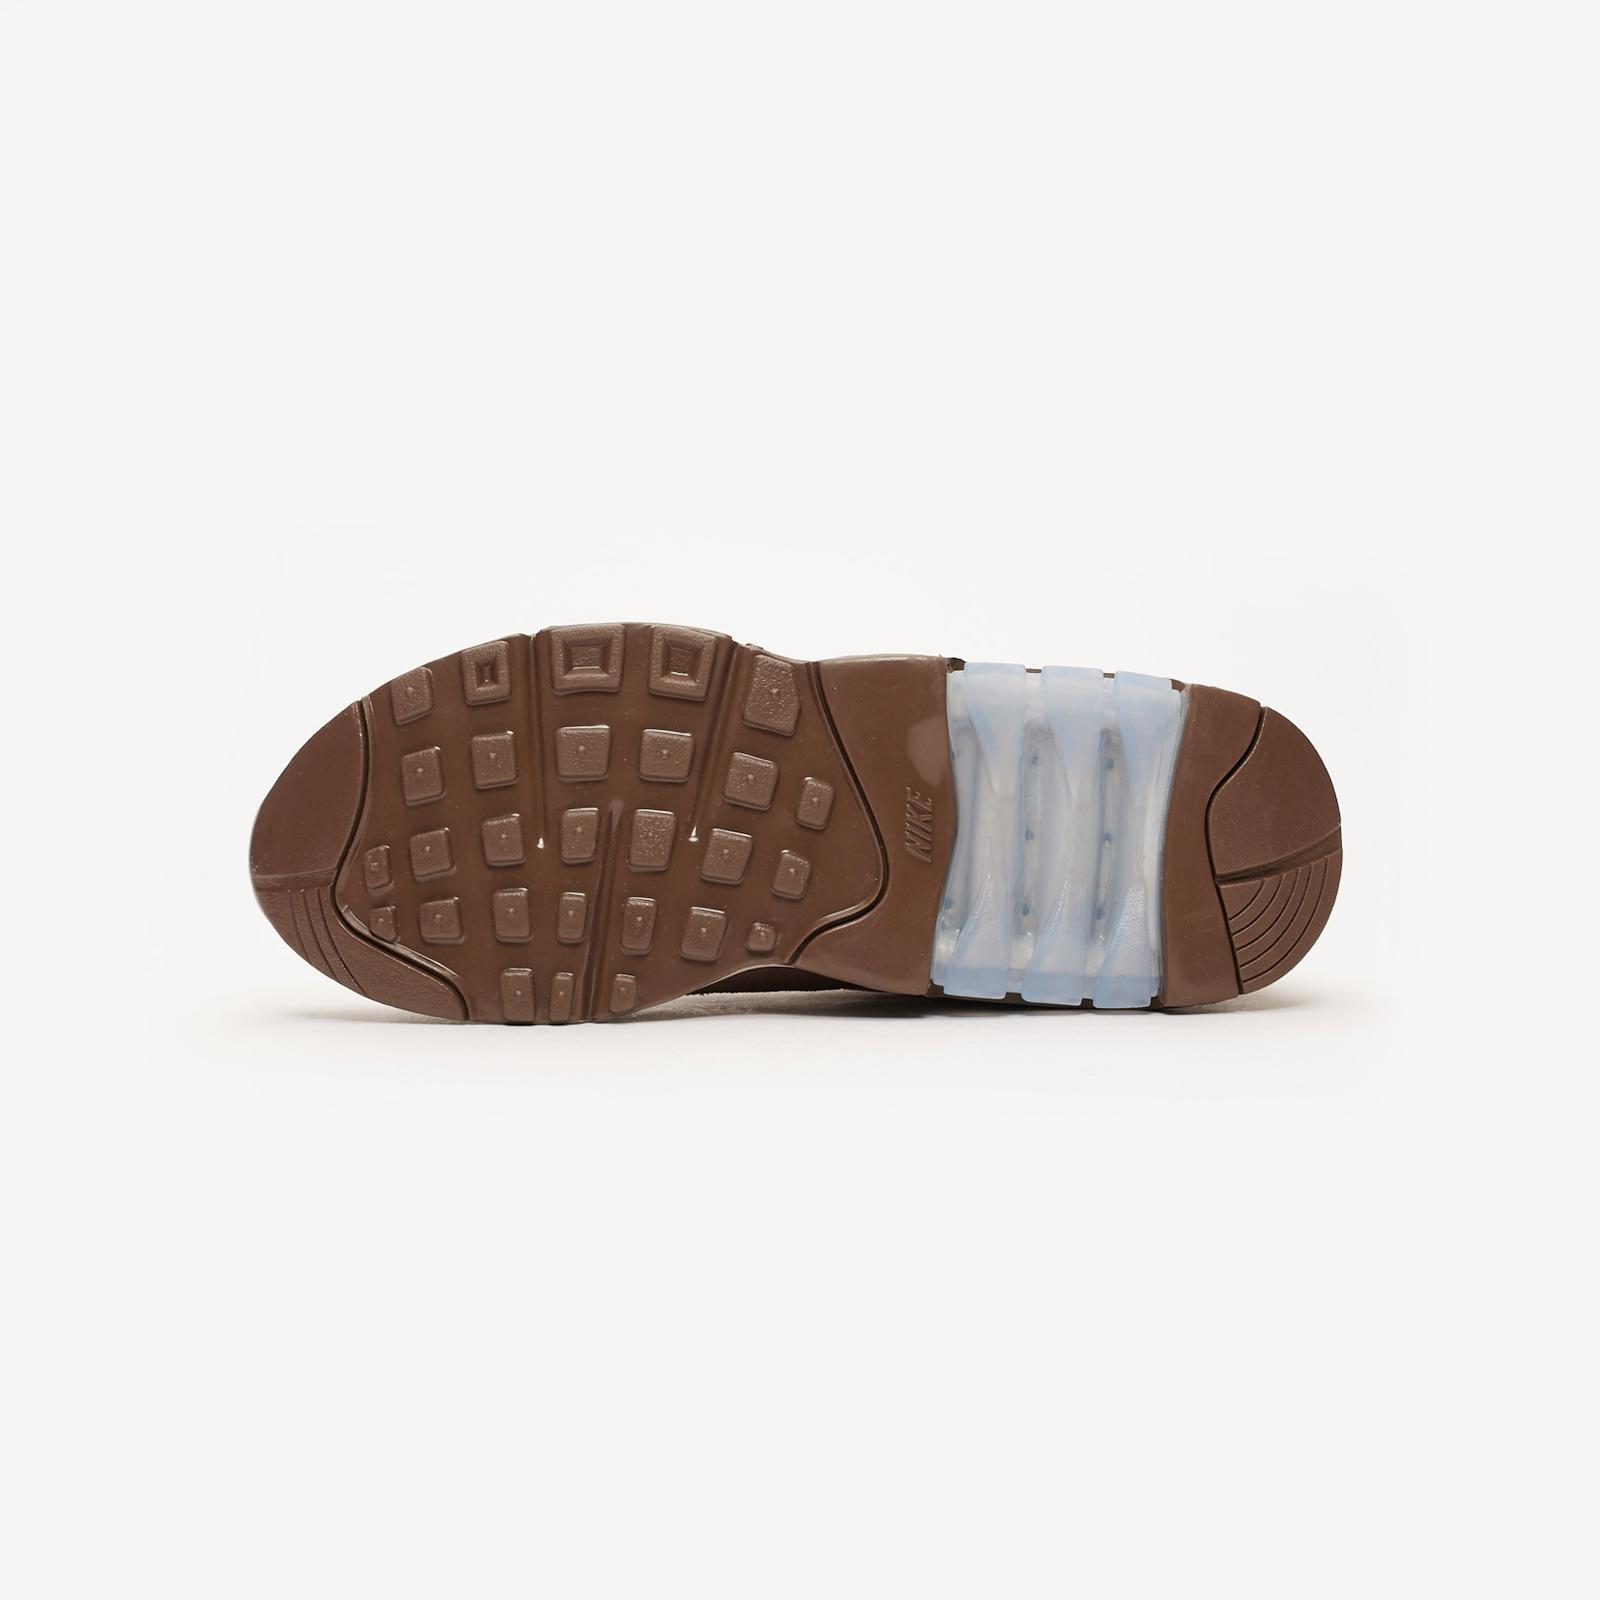 fa254bd44c Nike Air Max 180 - Av7023-200 - Sneakersnstuff | sneakers & streetwear  online since 1999